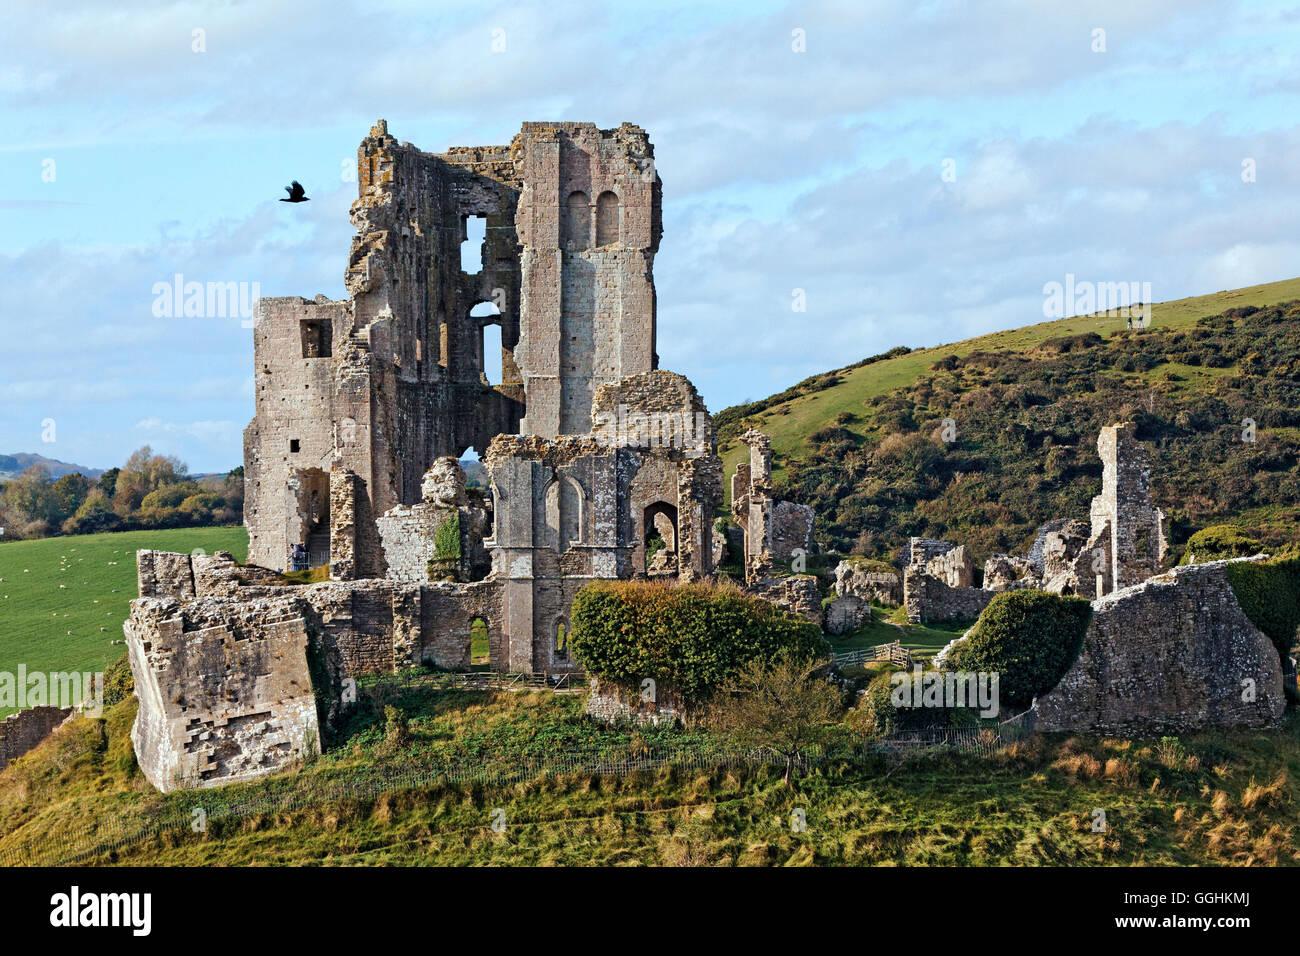 Château de Corfe, Dorset, Angleterre, Grande-Bretagne Photo Stock